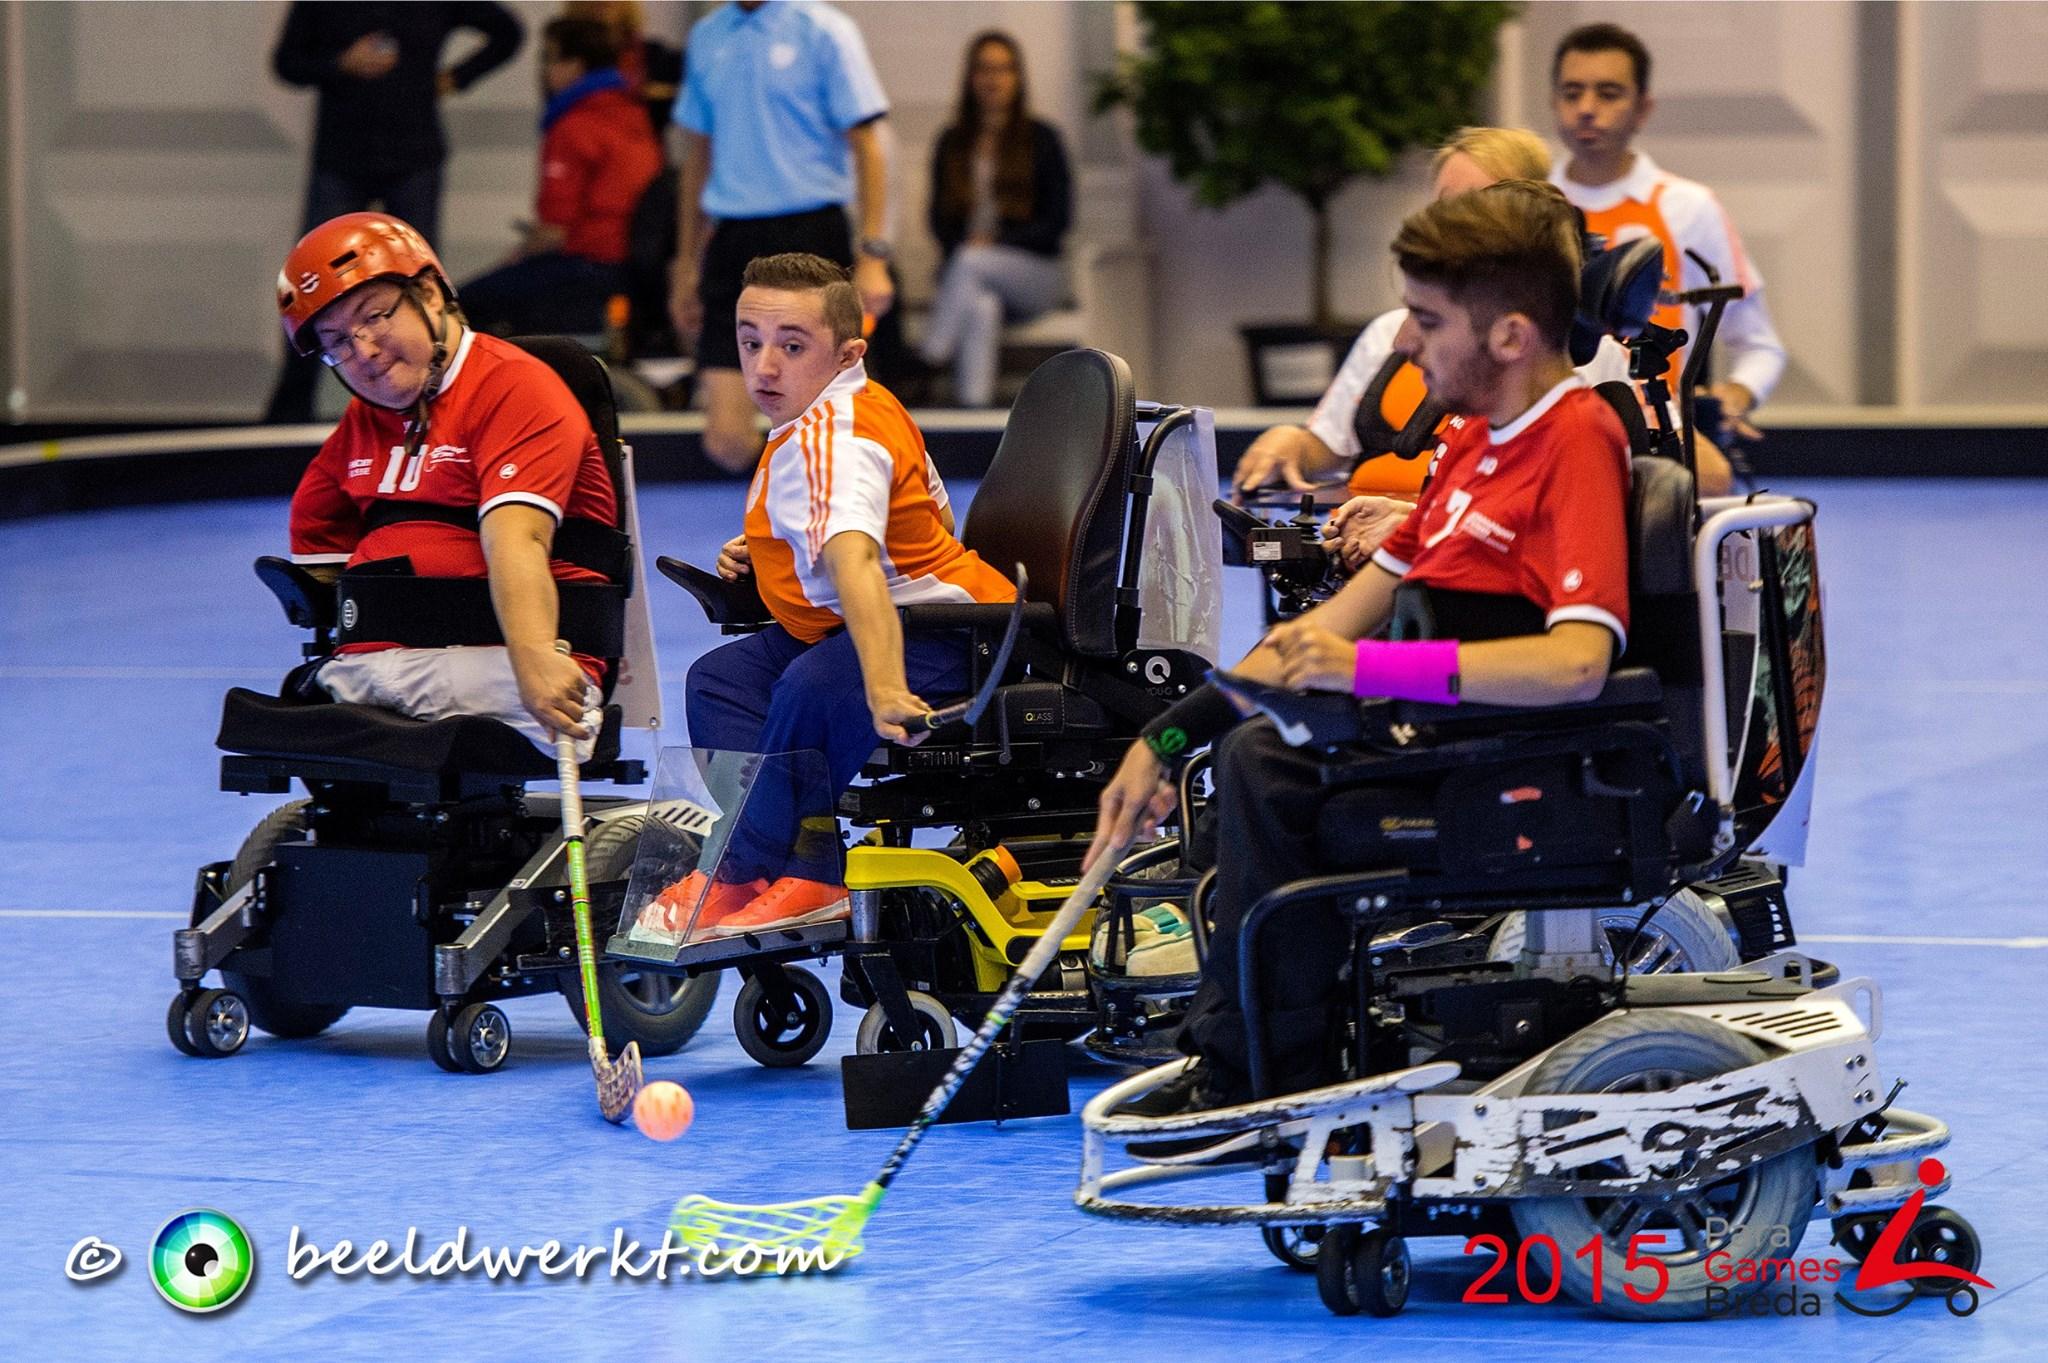 Powerchair hockey - Sponsored by Webelephant Breda ...